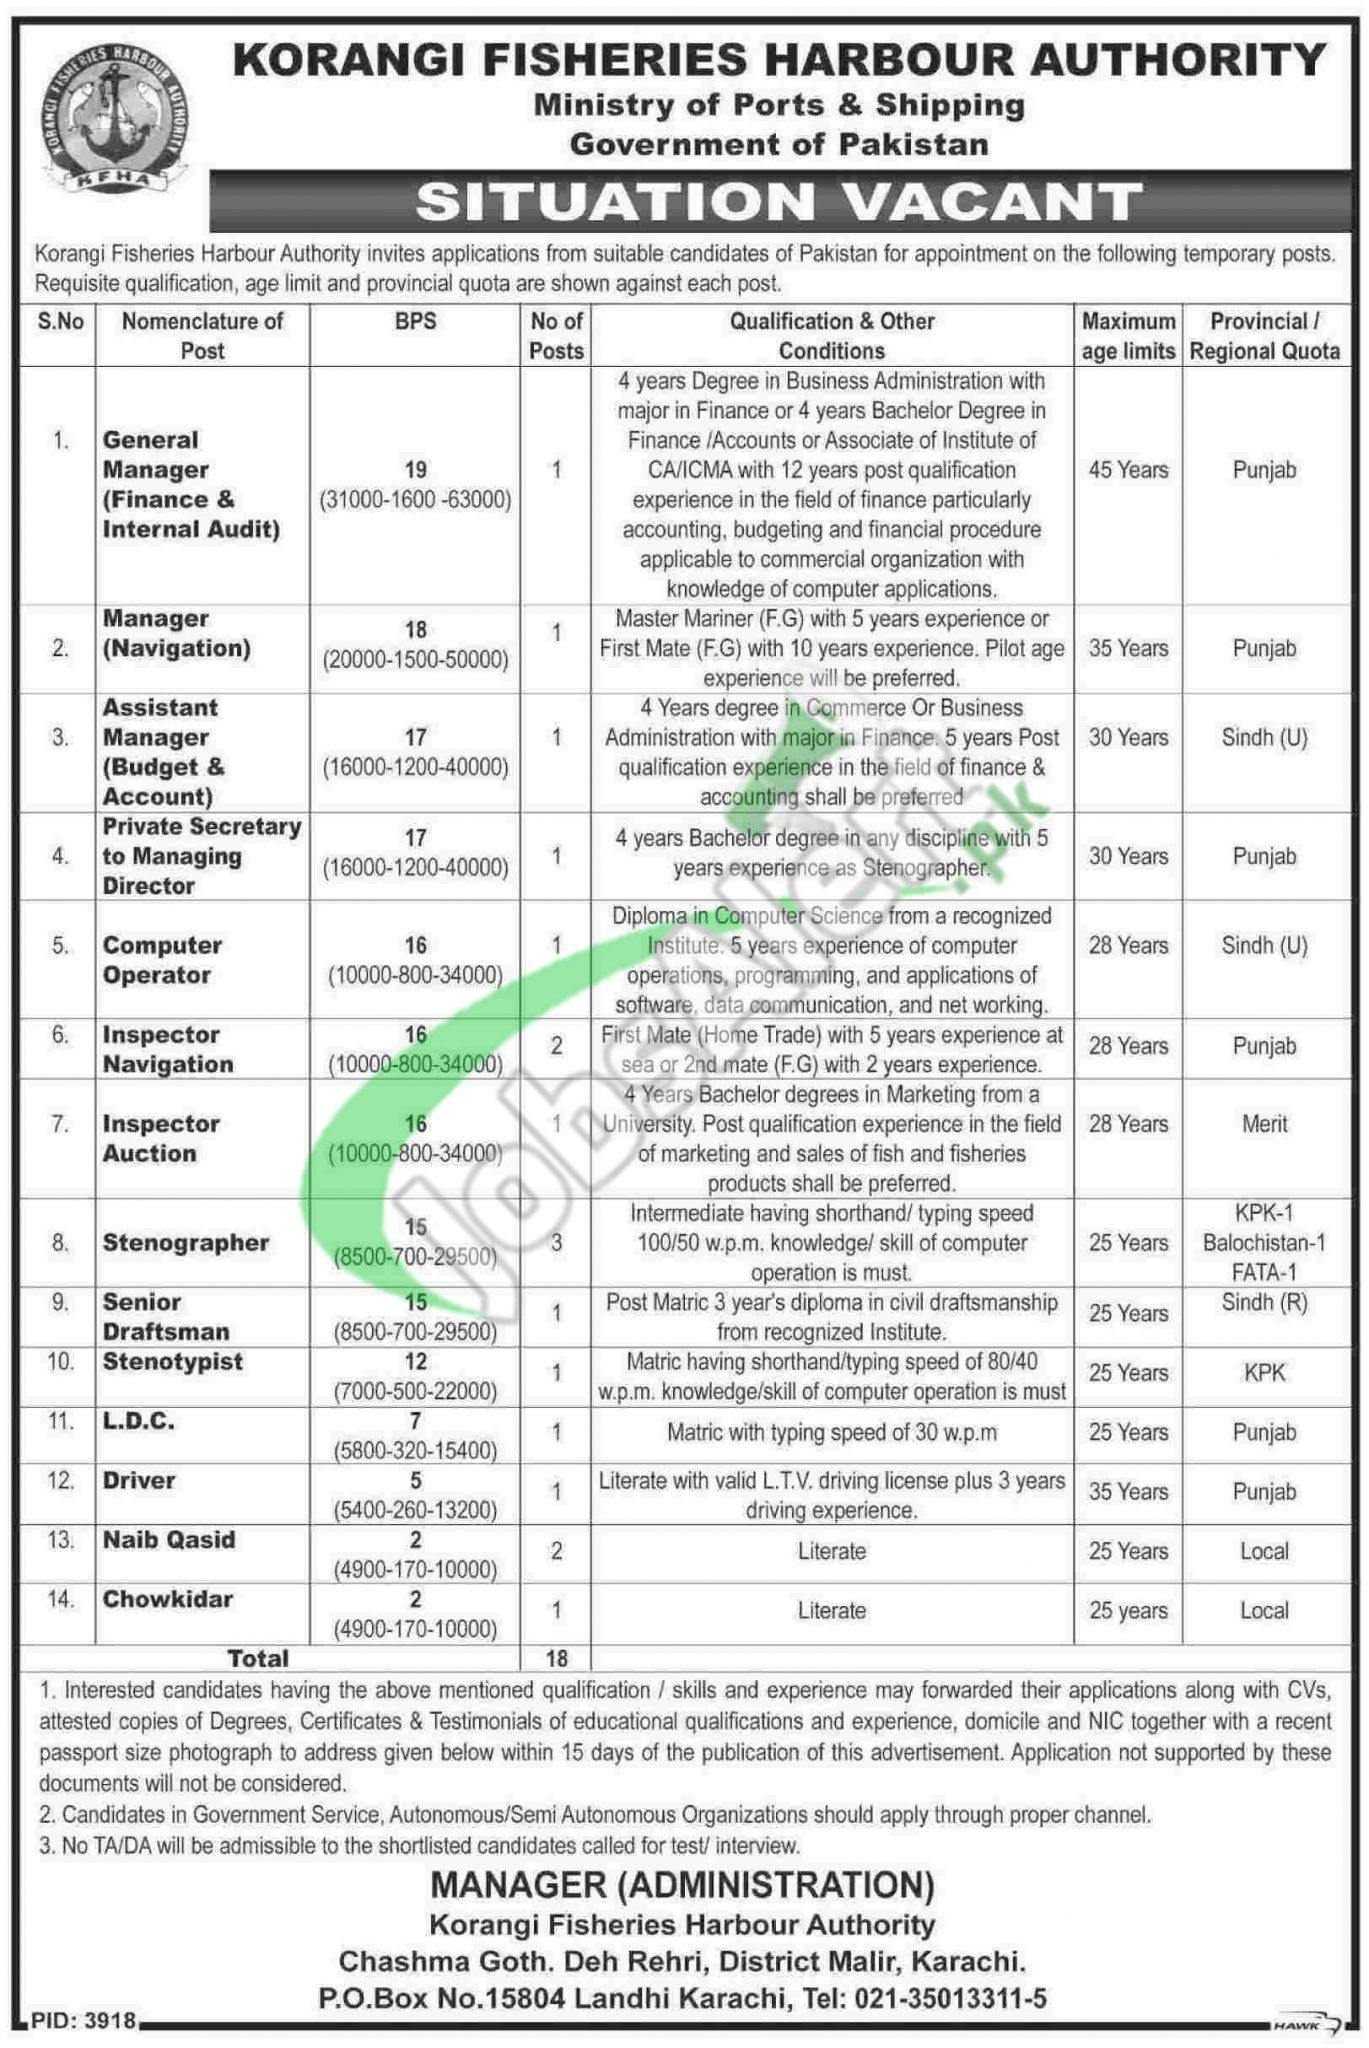 Korangi Fisheries Harbour Authority Jobs 2015 Punjab Sindh